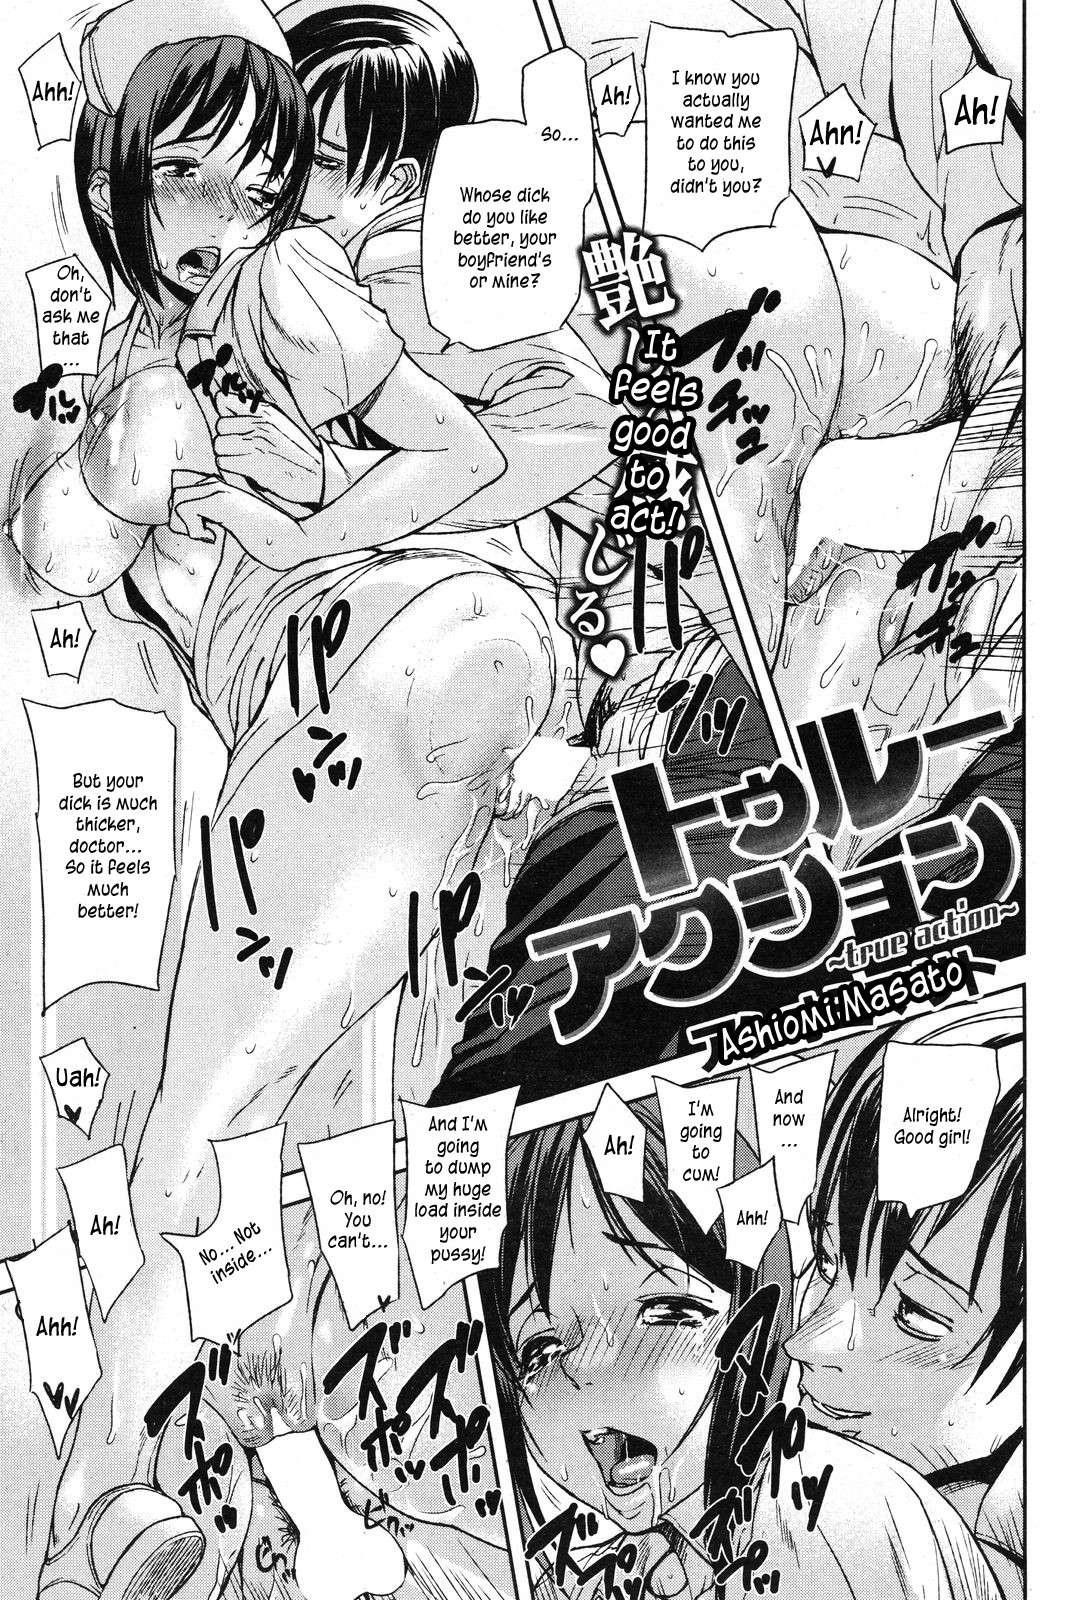 Hentai manga scans